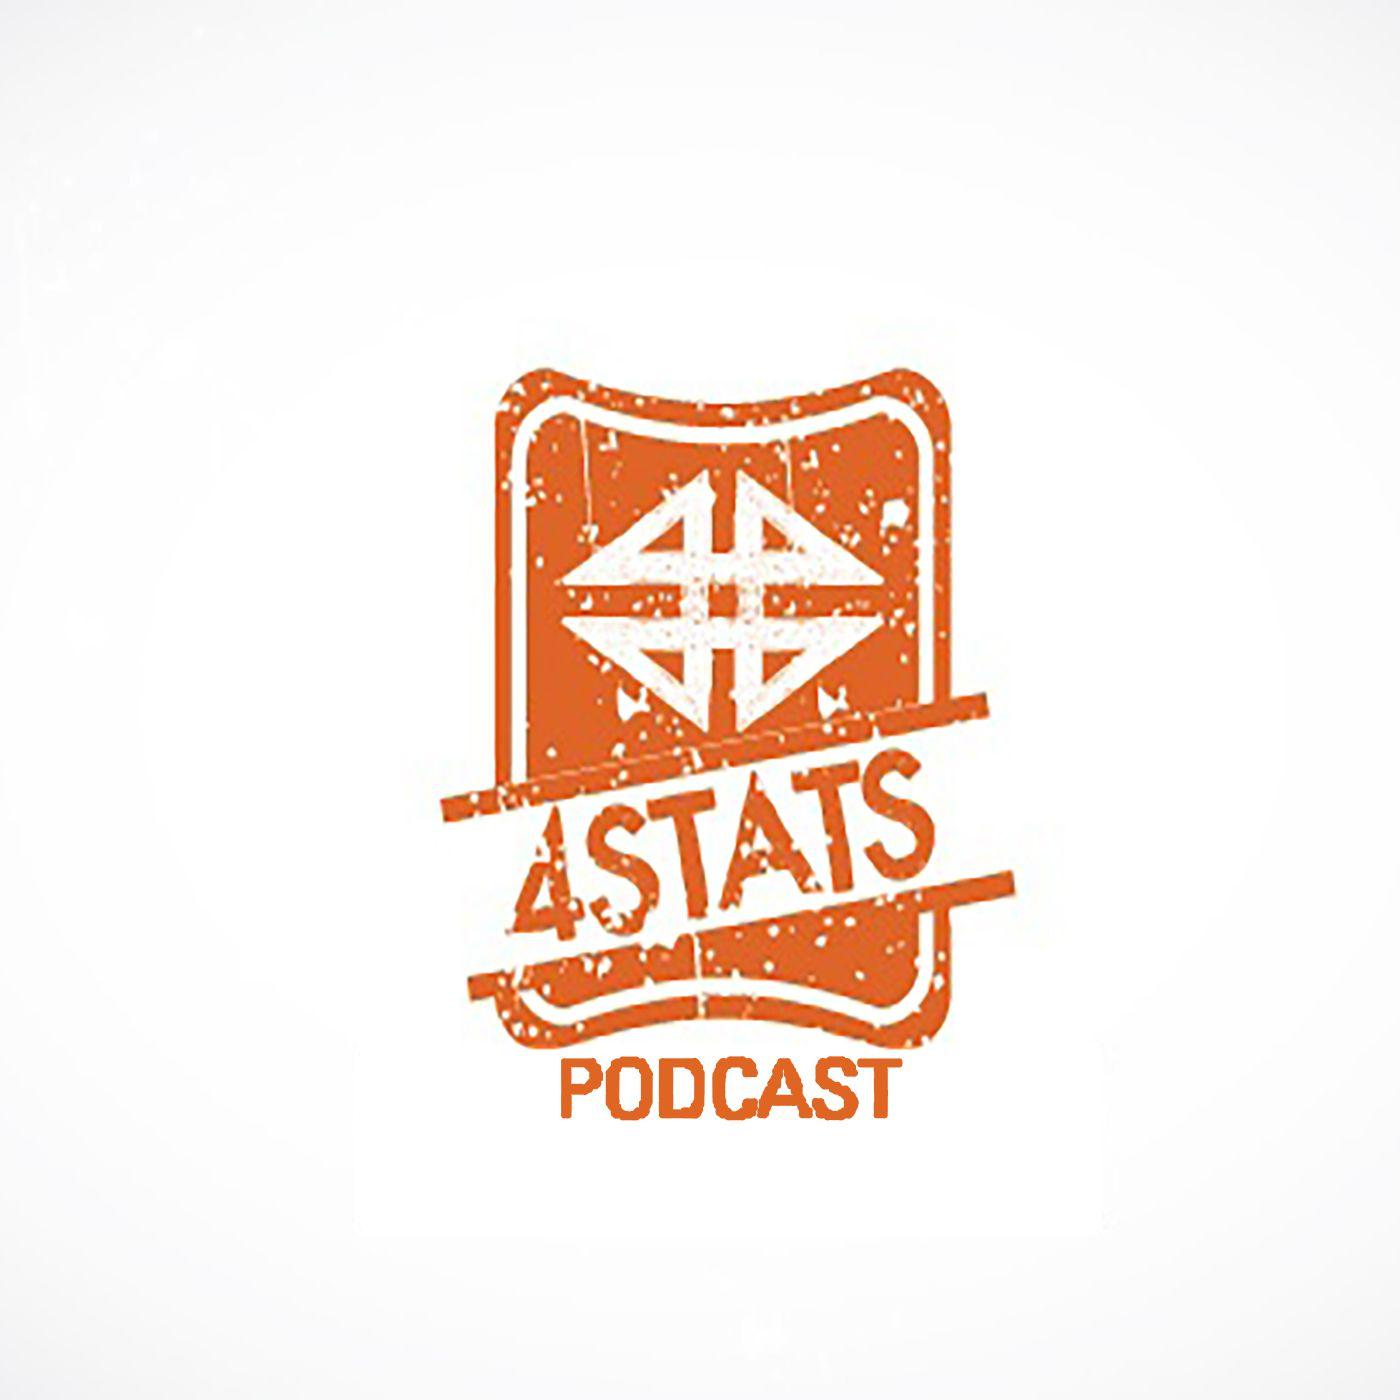 4Stats Podcast